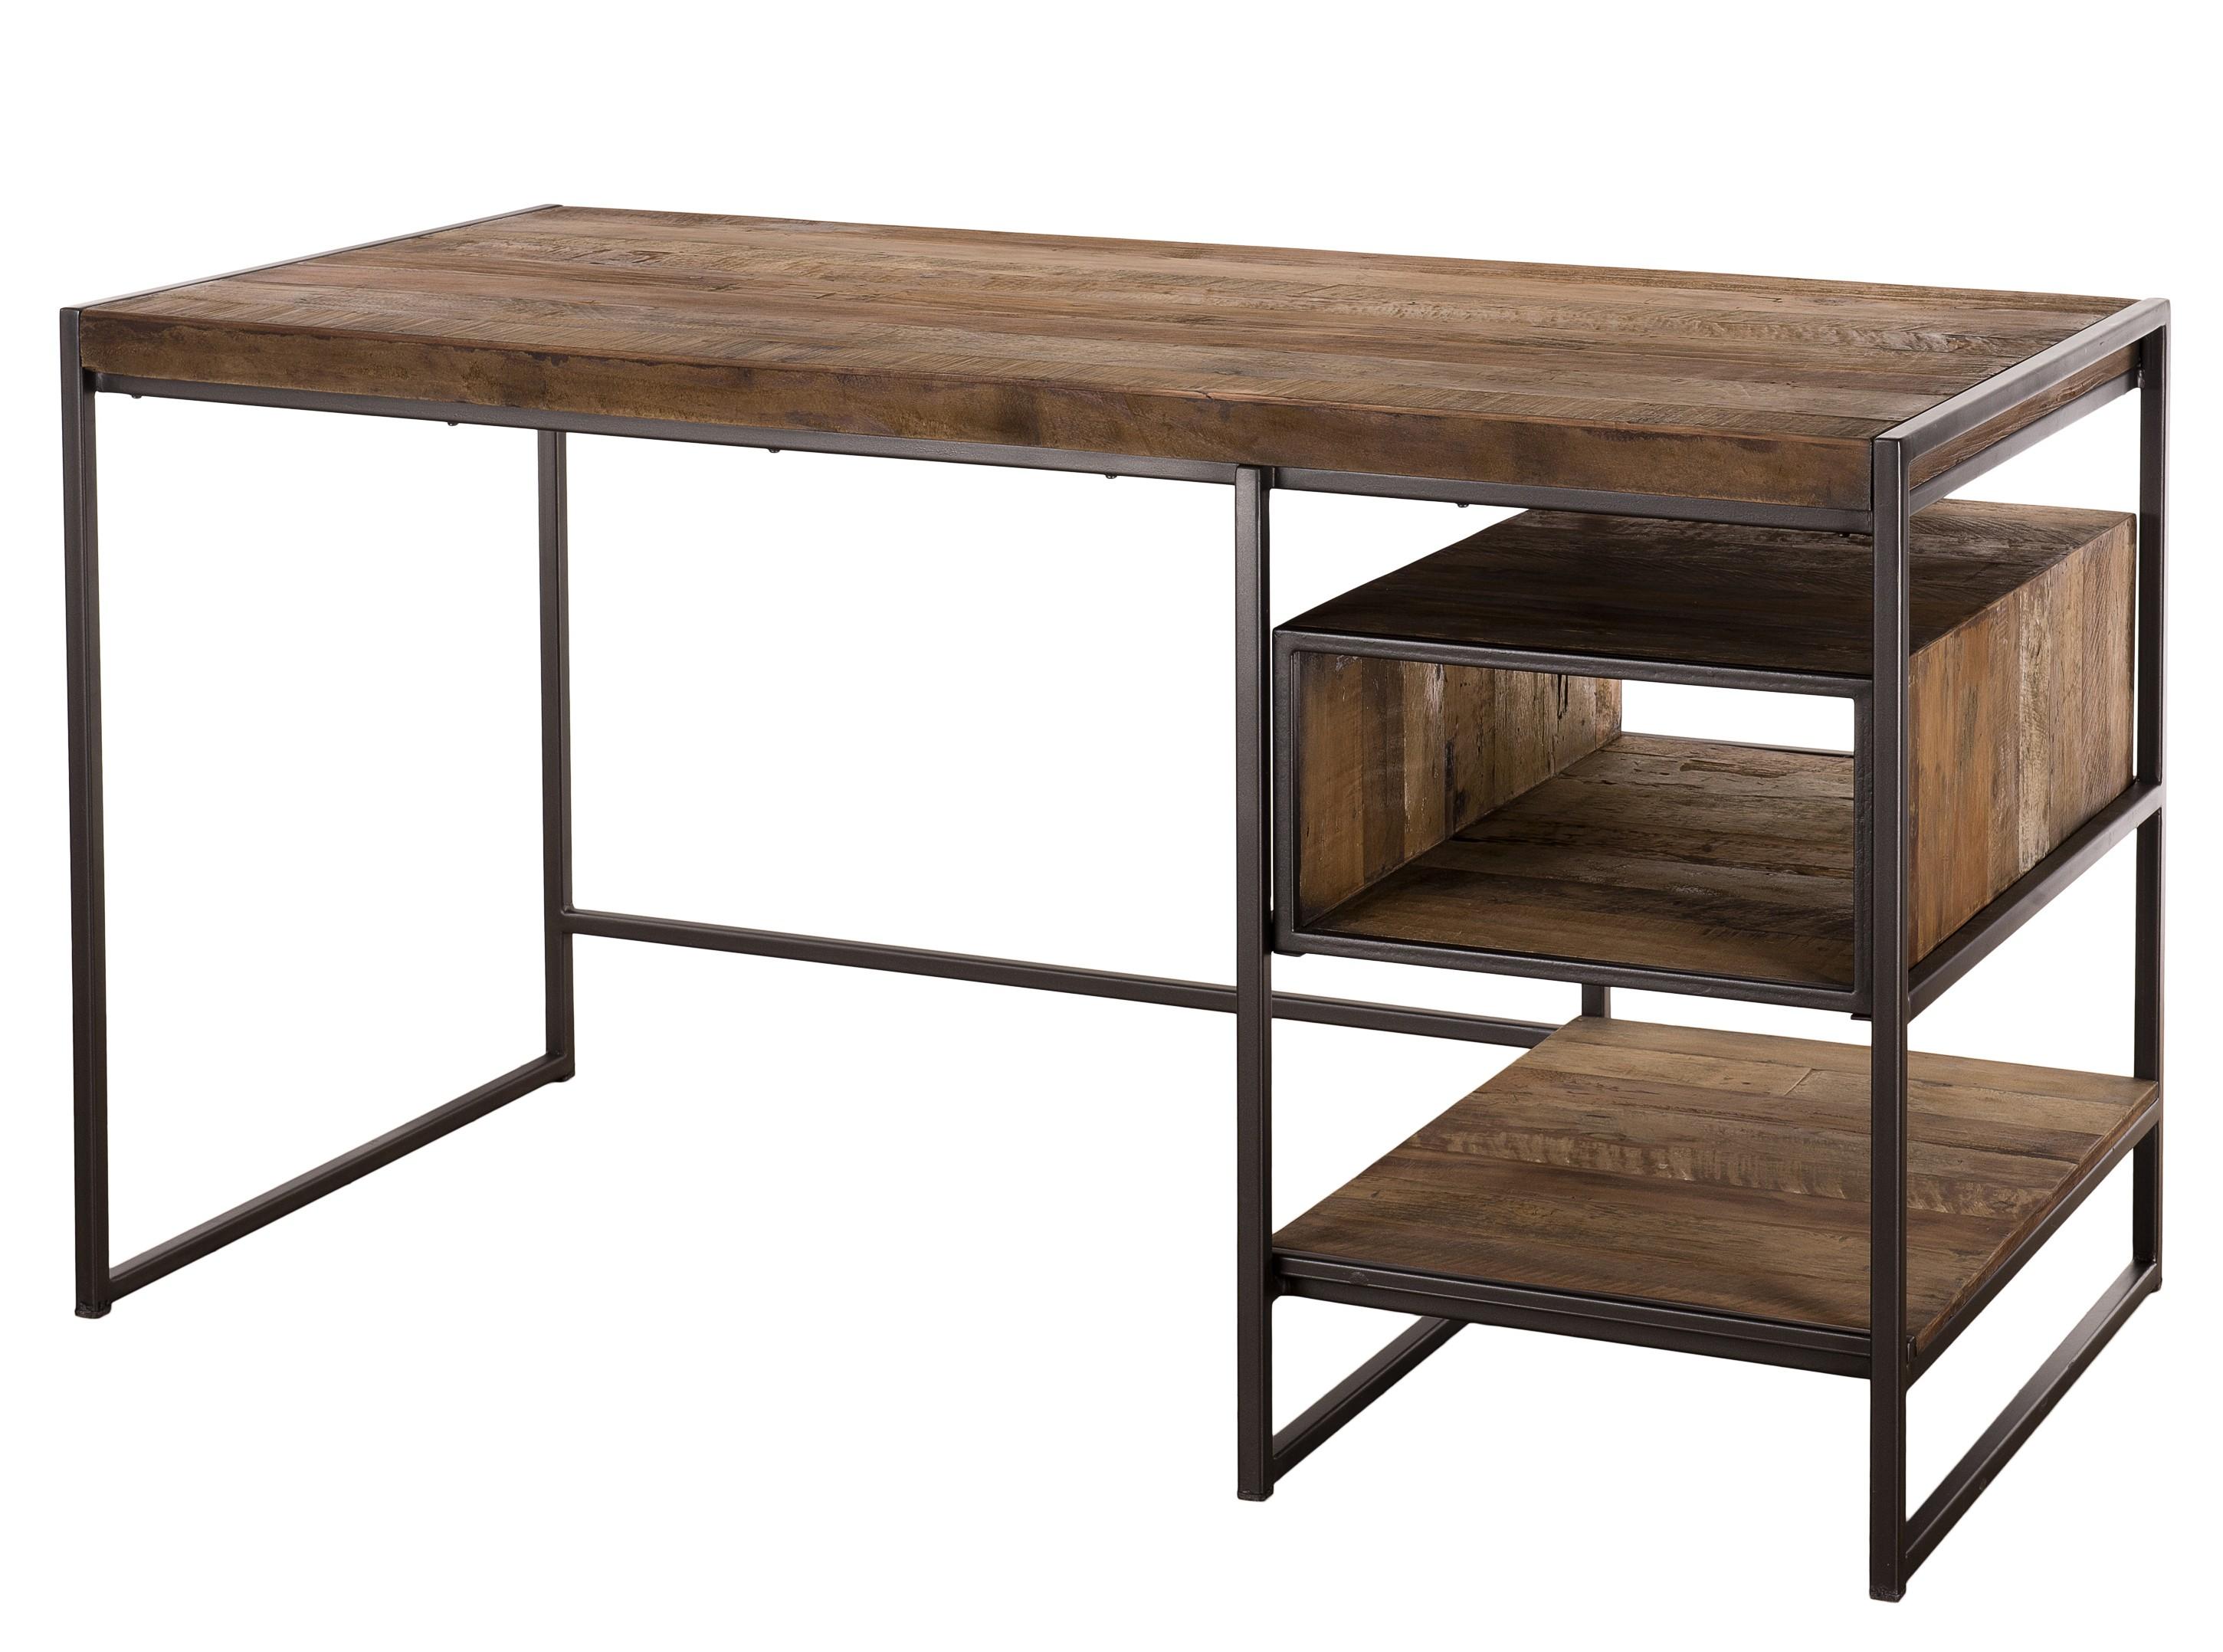 Bureau tiroir niche bois massif acacia et métal panka